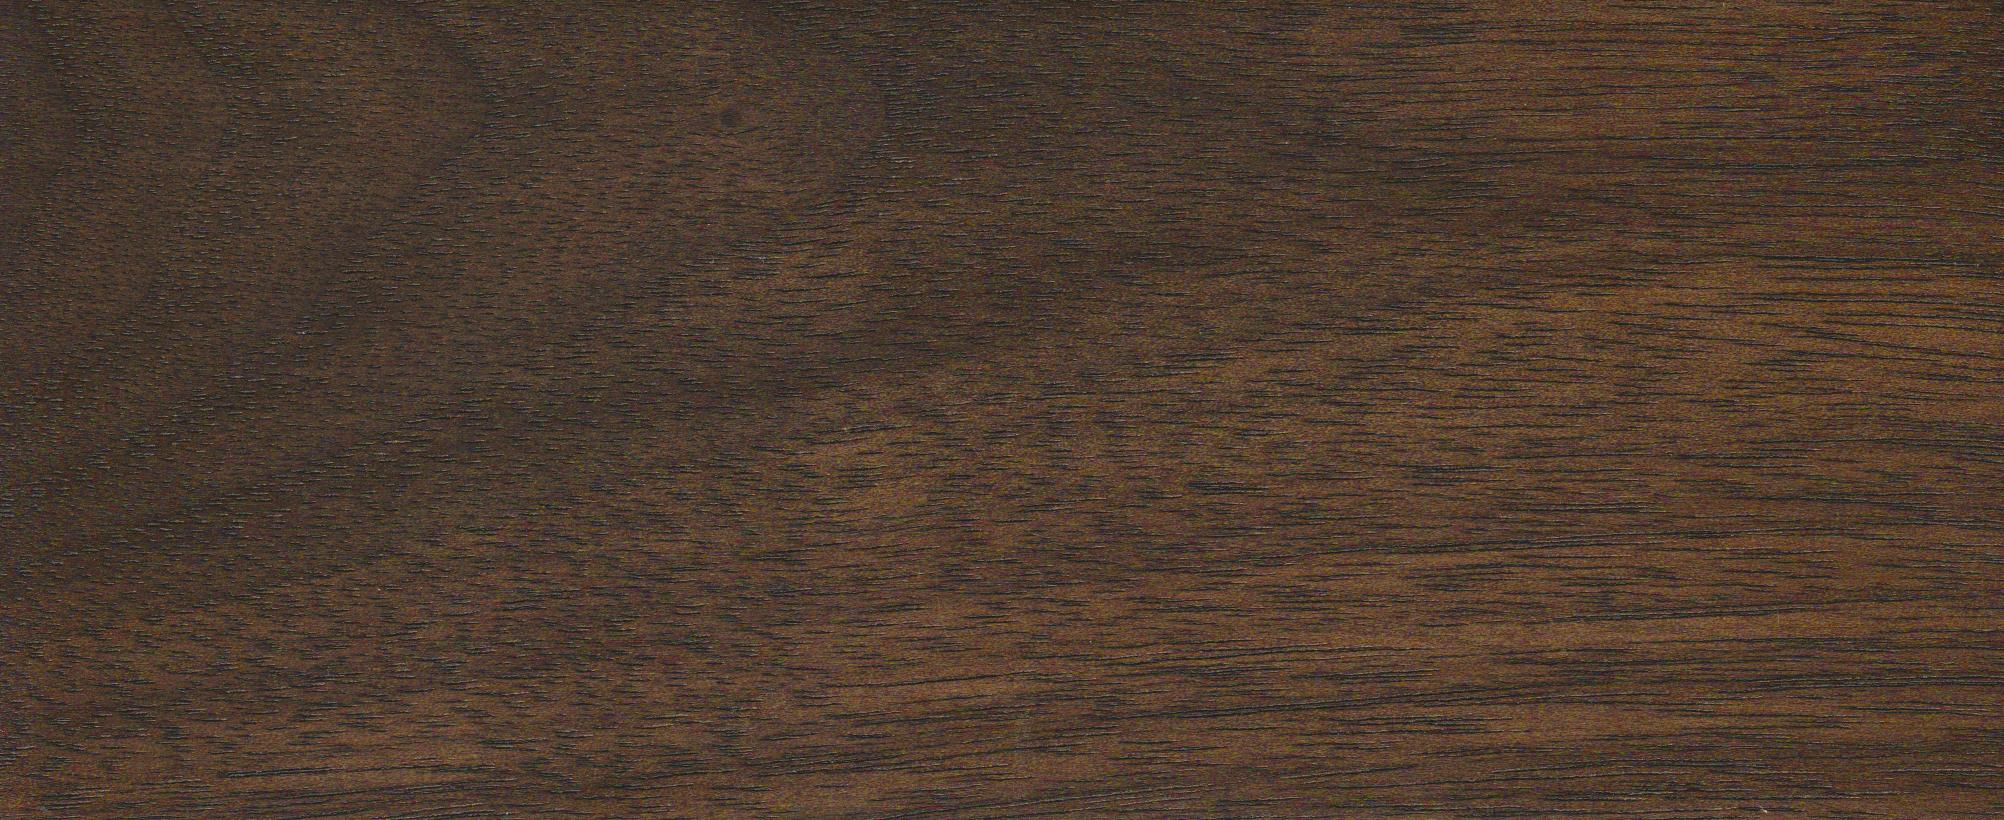 walnut - marrakech stained